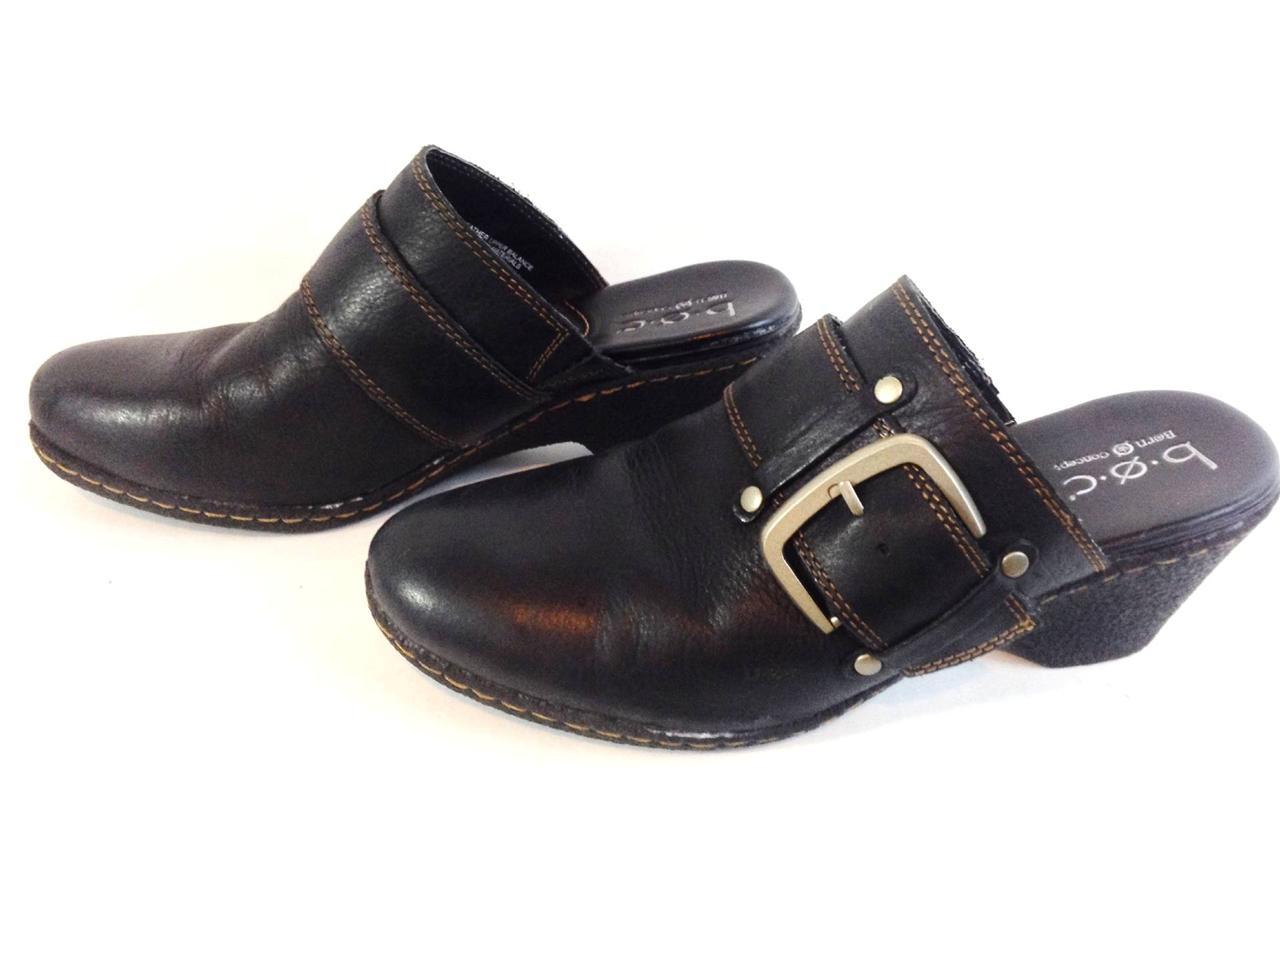 Boc Clog Shoes Black   M Ebay